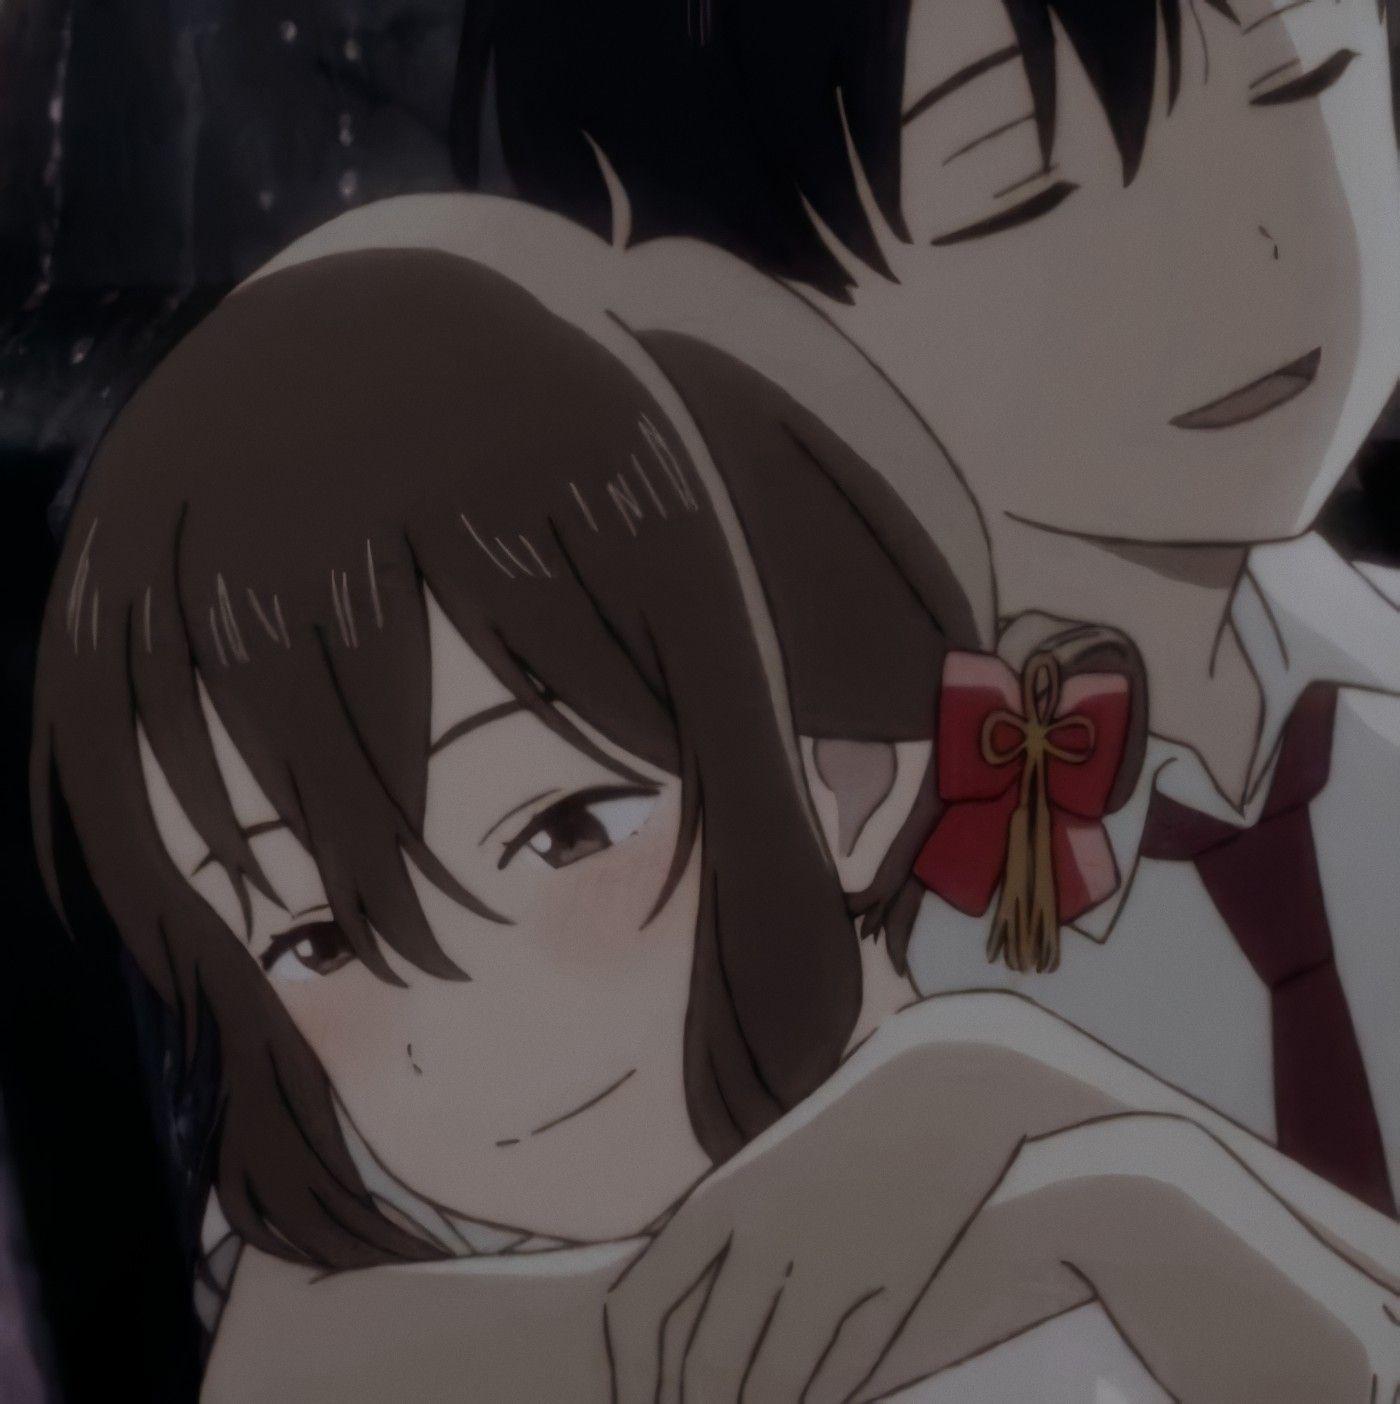 Pin oleh Lyn Nhie di Gambar anime di 2020 Gambar anime